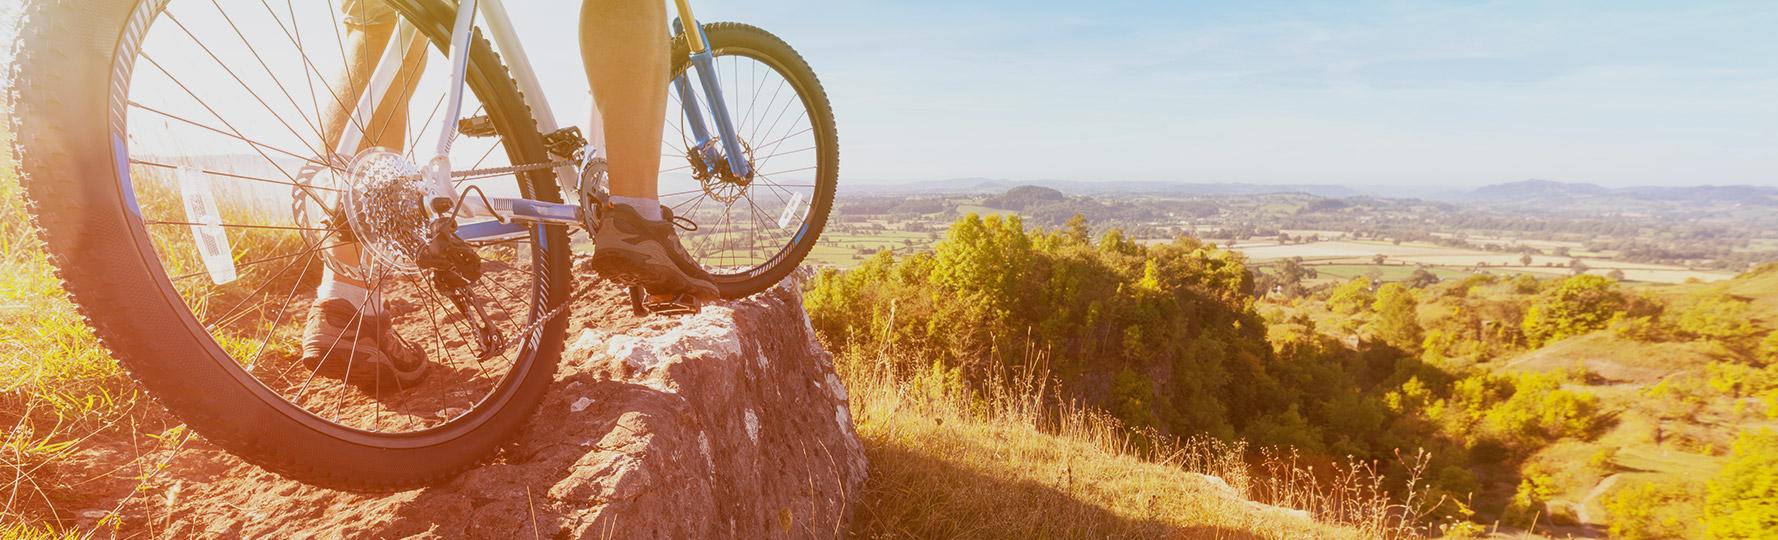 Boka cykelutrustning